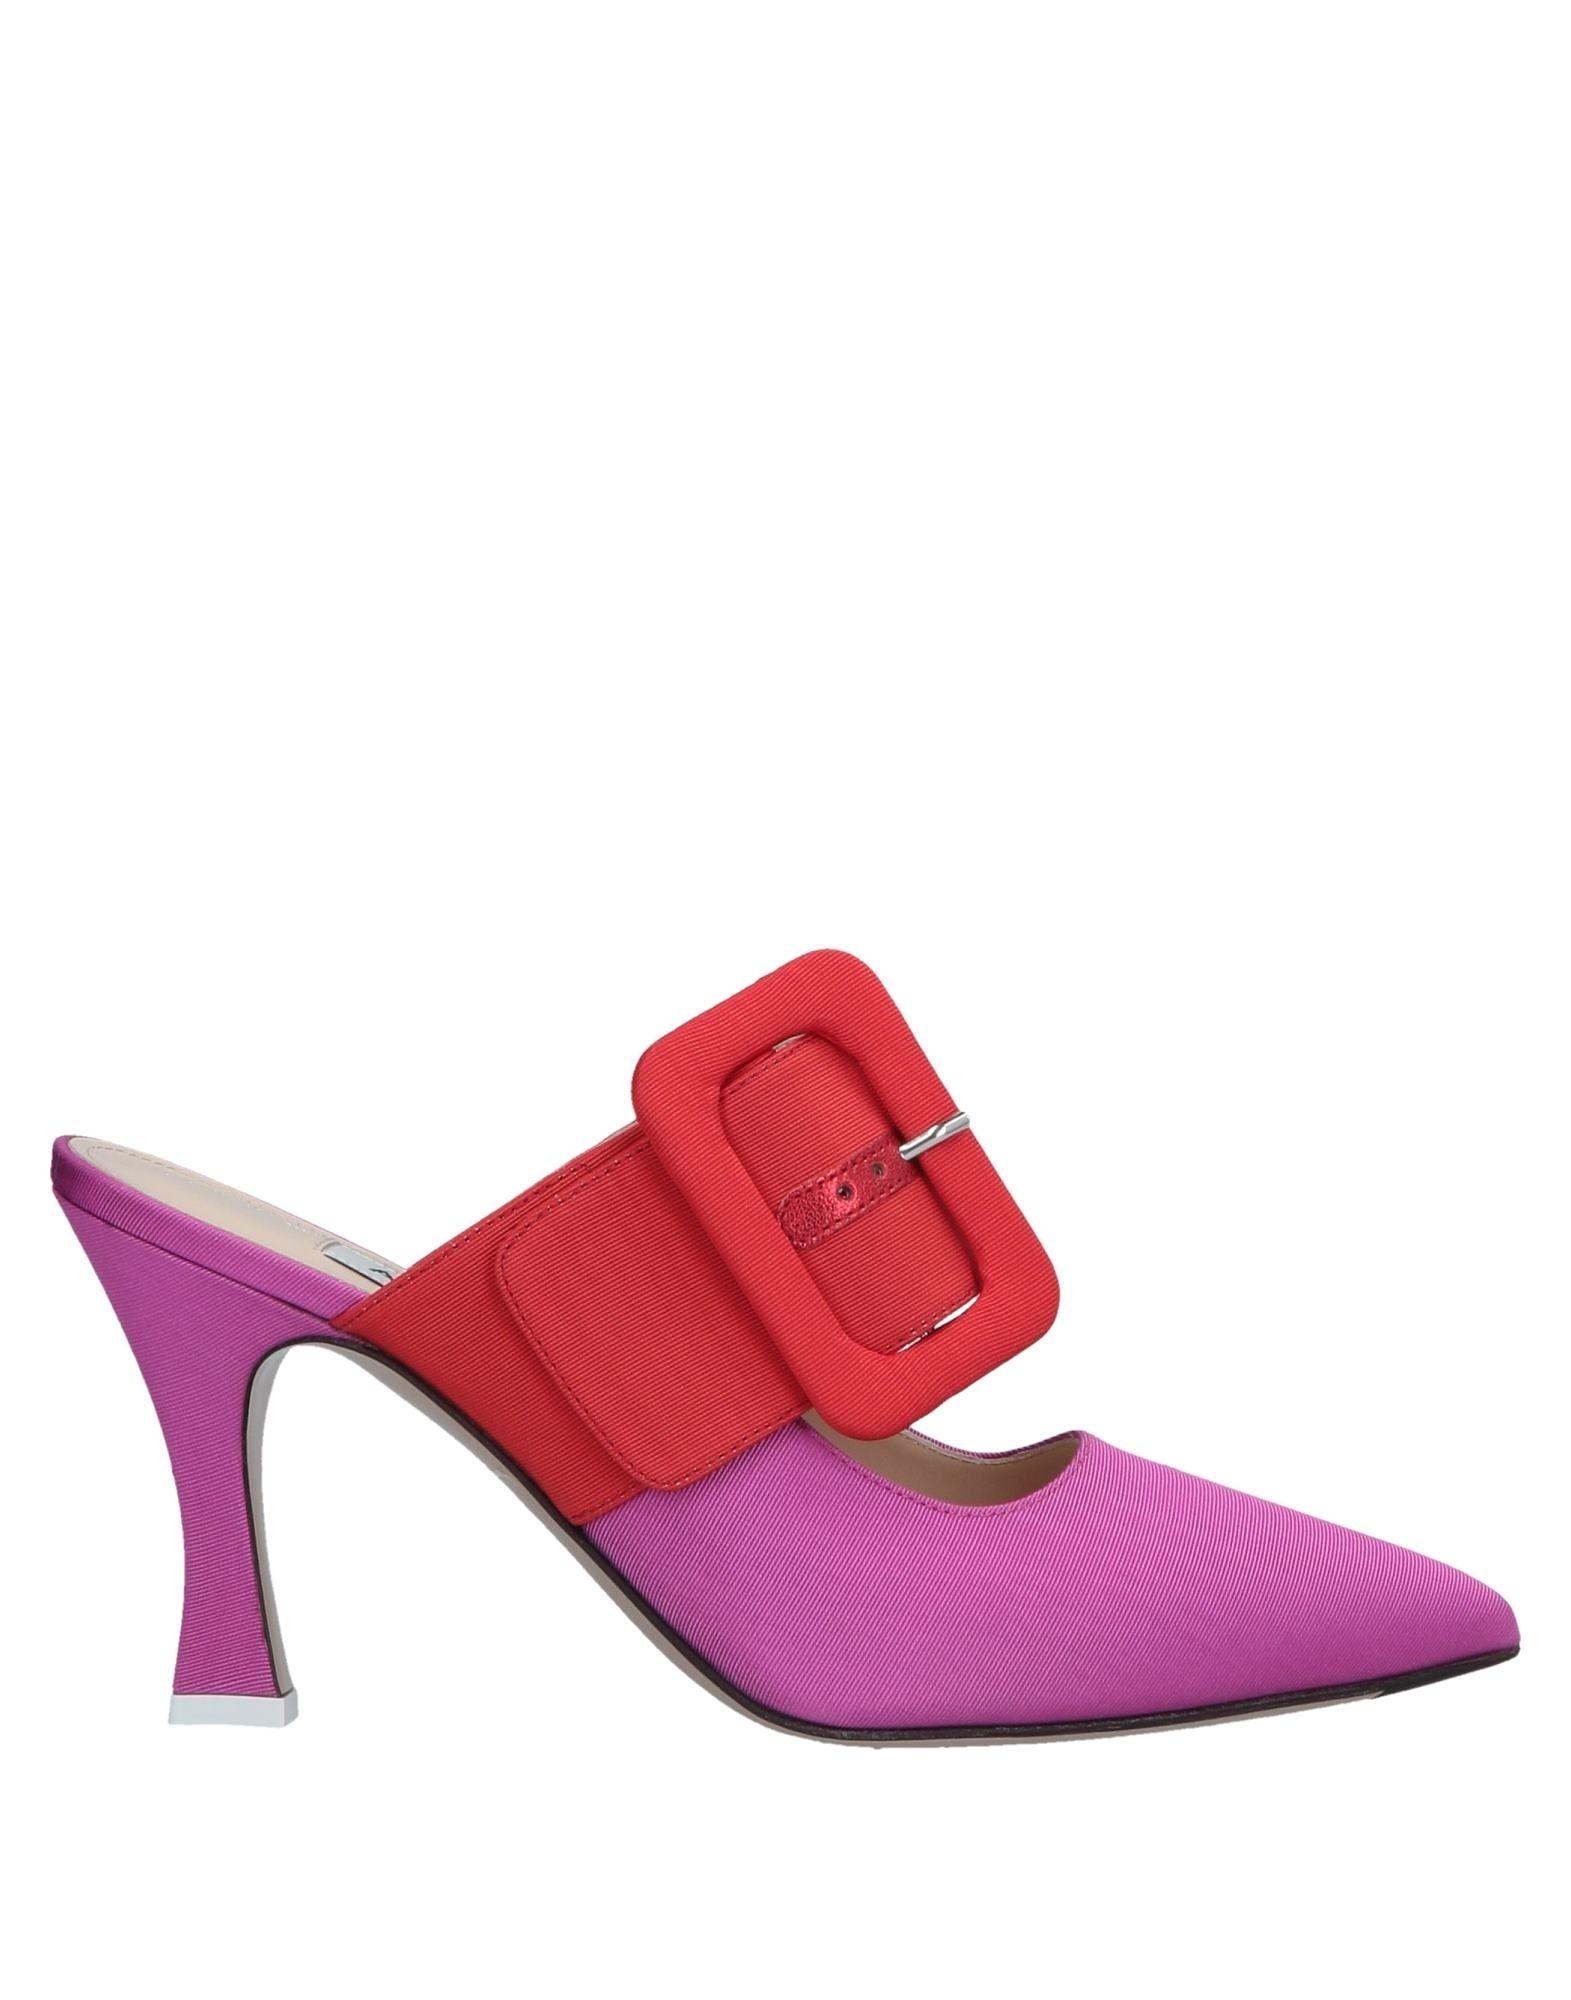 best sneakers 8add8 ec4b8 Fucsia Zuecos Attico Attico Attico Mujer - Zuecos Attico Cómodo y bien  parecido a67928